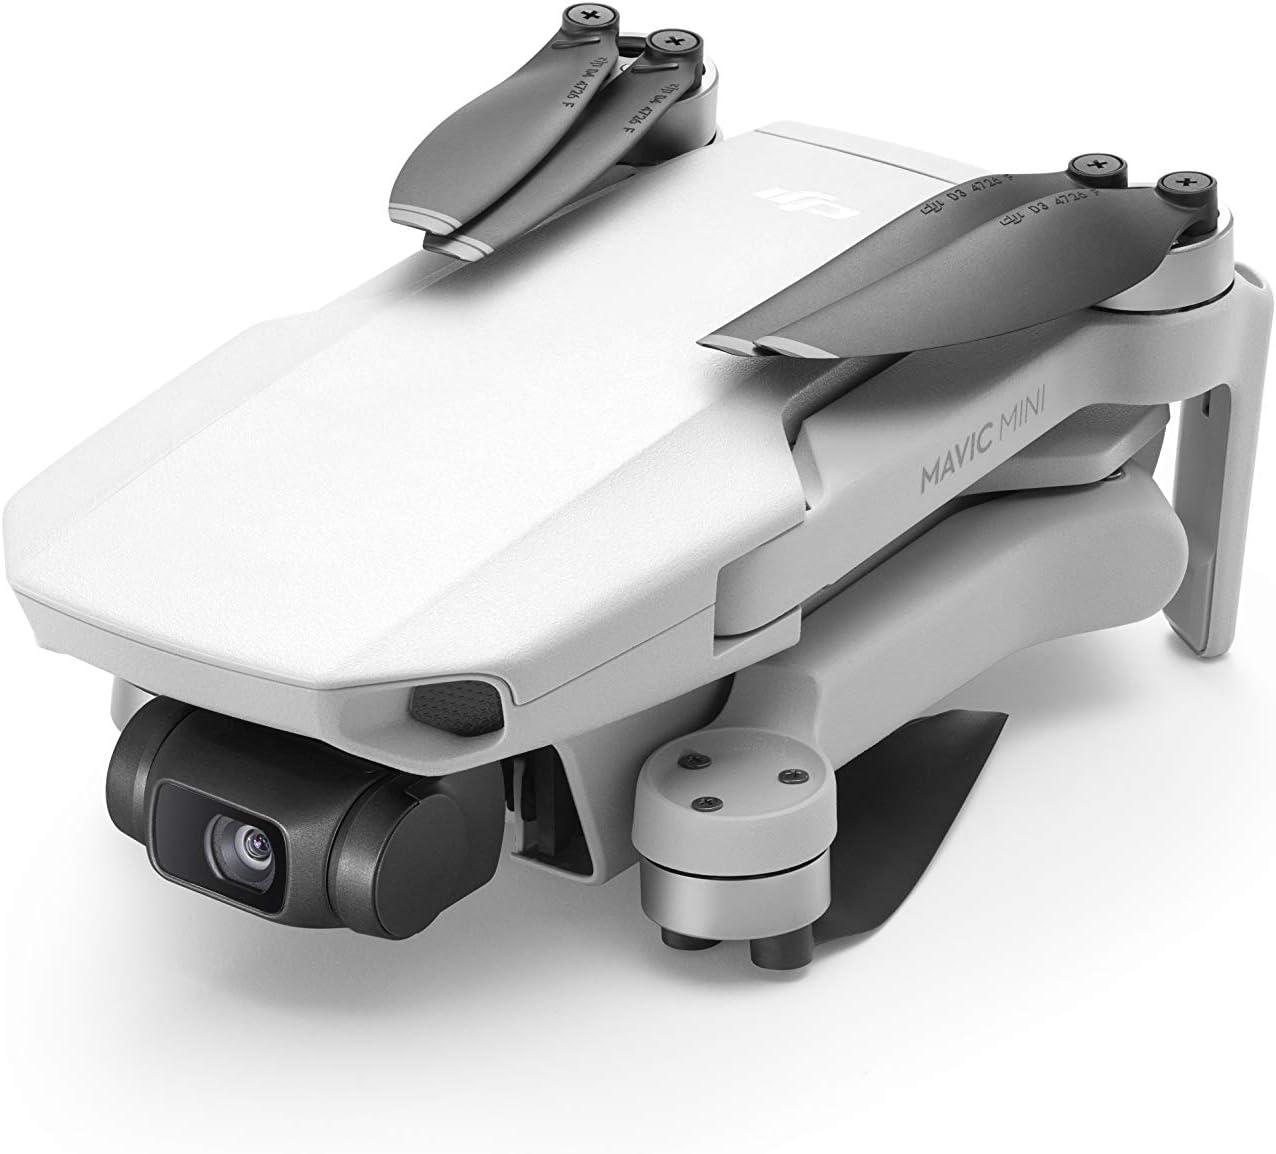 van life gifts mavic mini drone